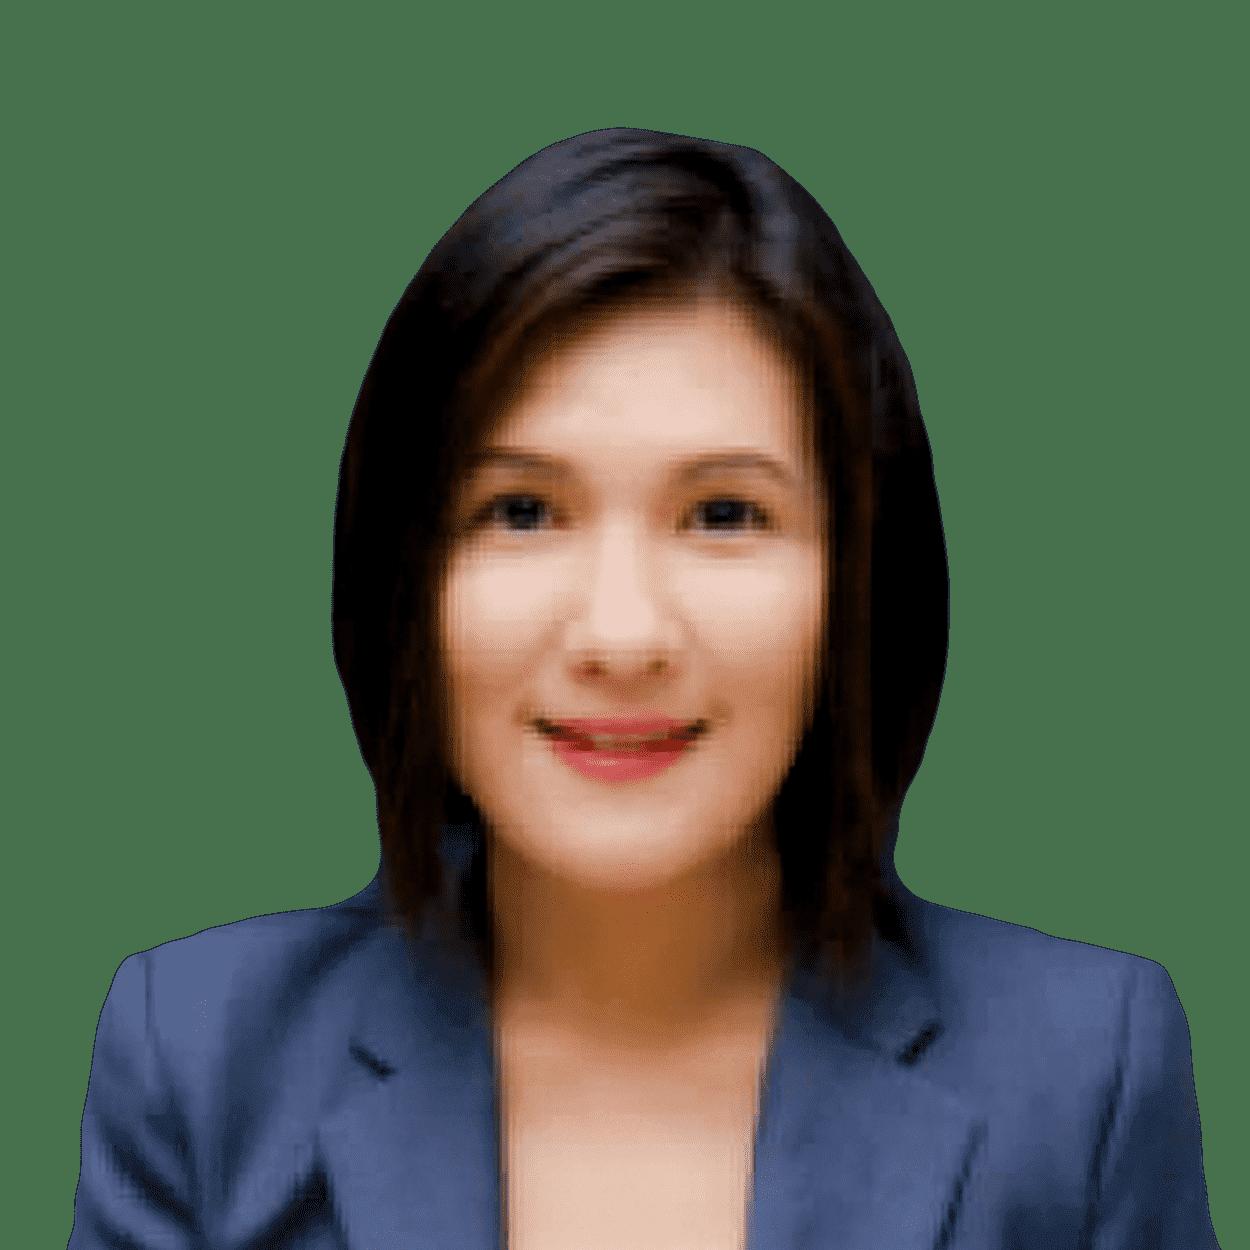 Marle-Baybay-MSIET-Philippines-1-min-min